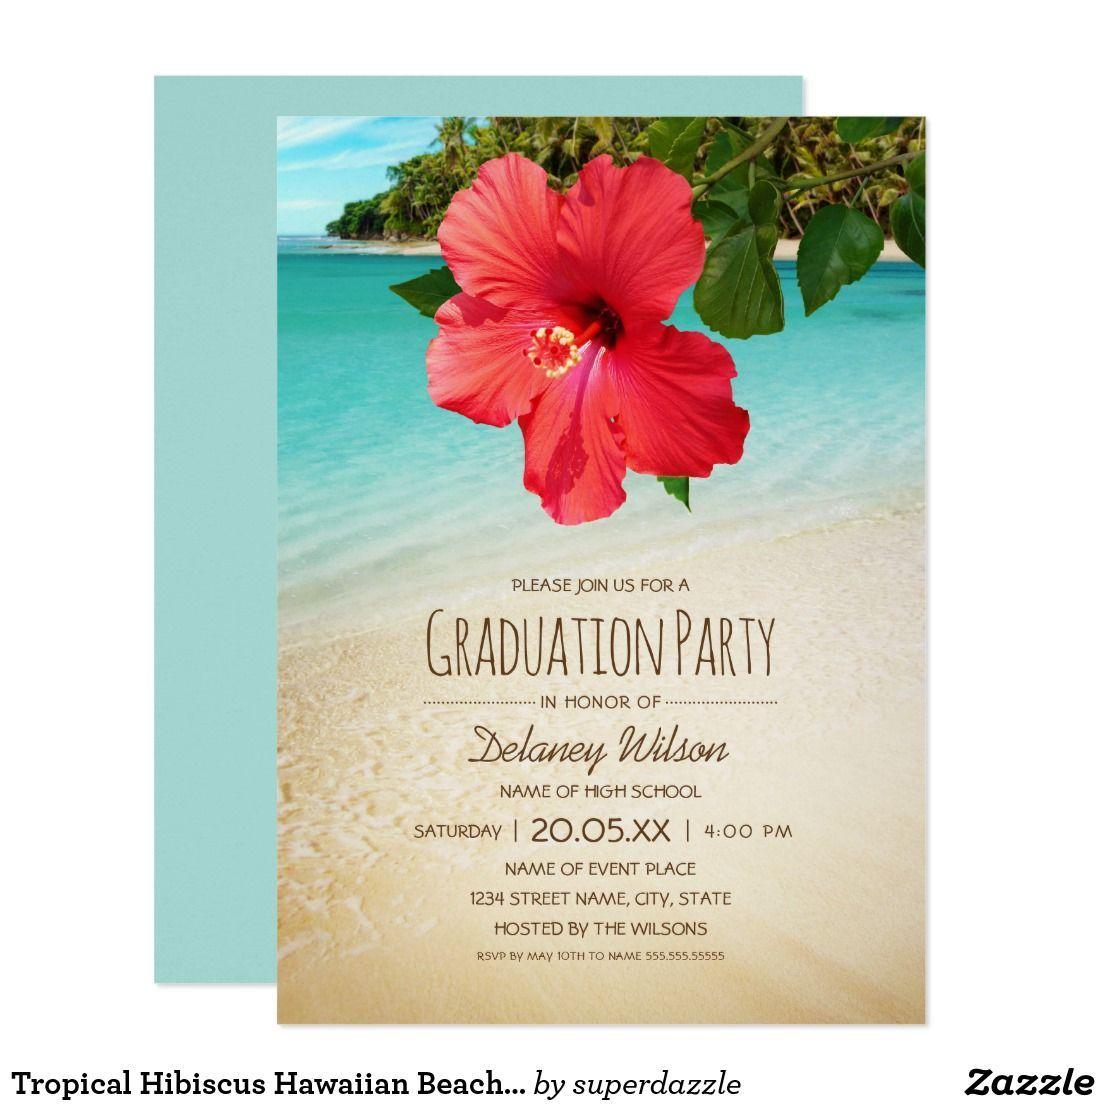 Tropical Hibiscus Hawaiian Beach Graduation Party Card Tropical ...